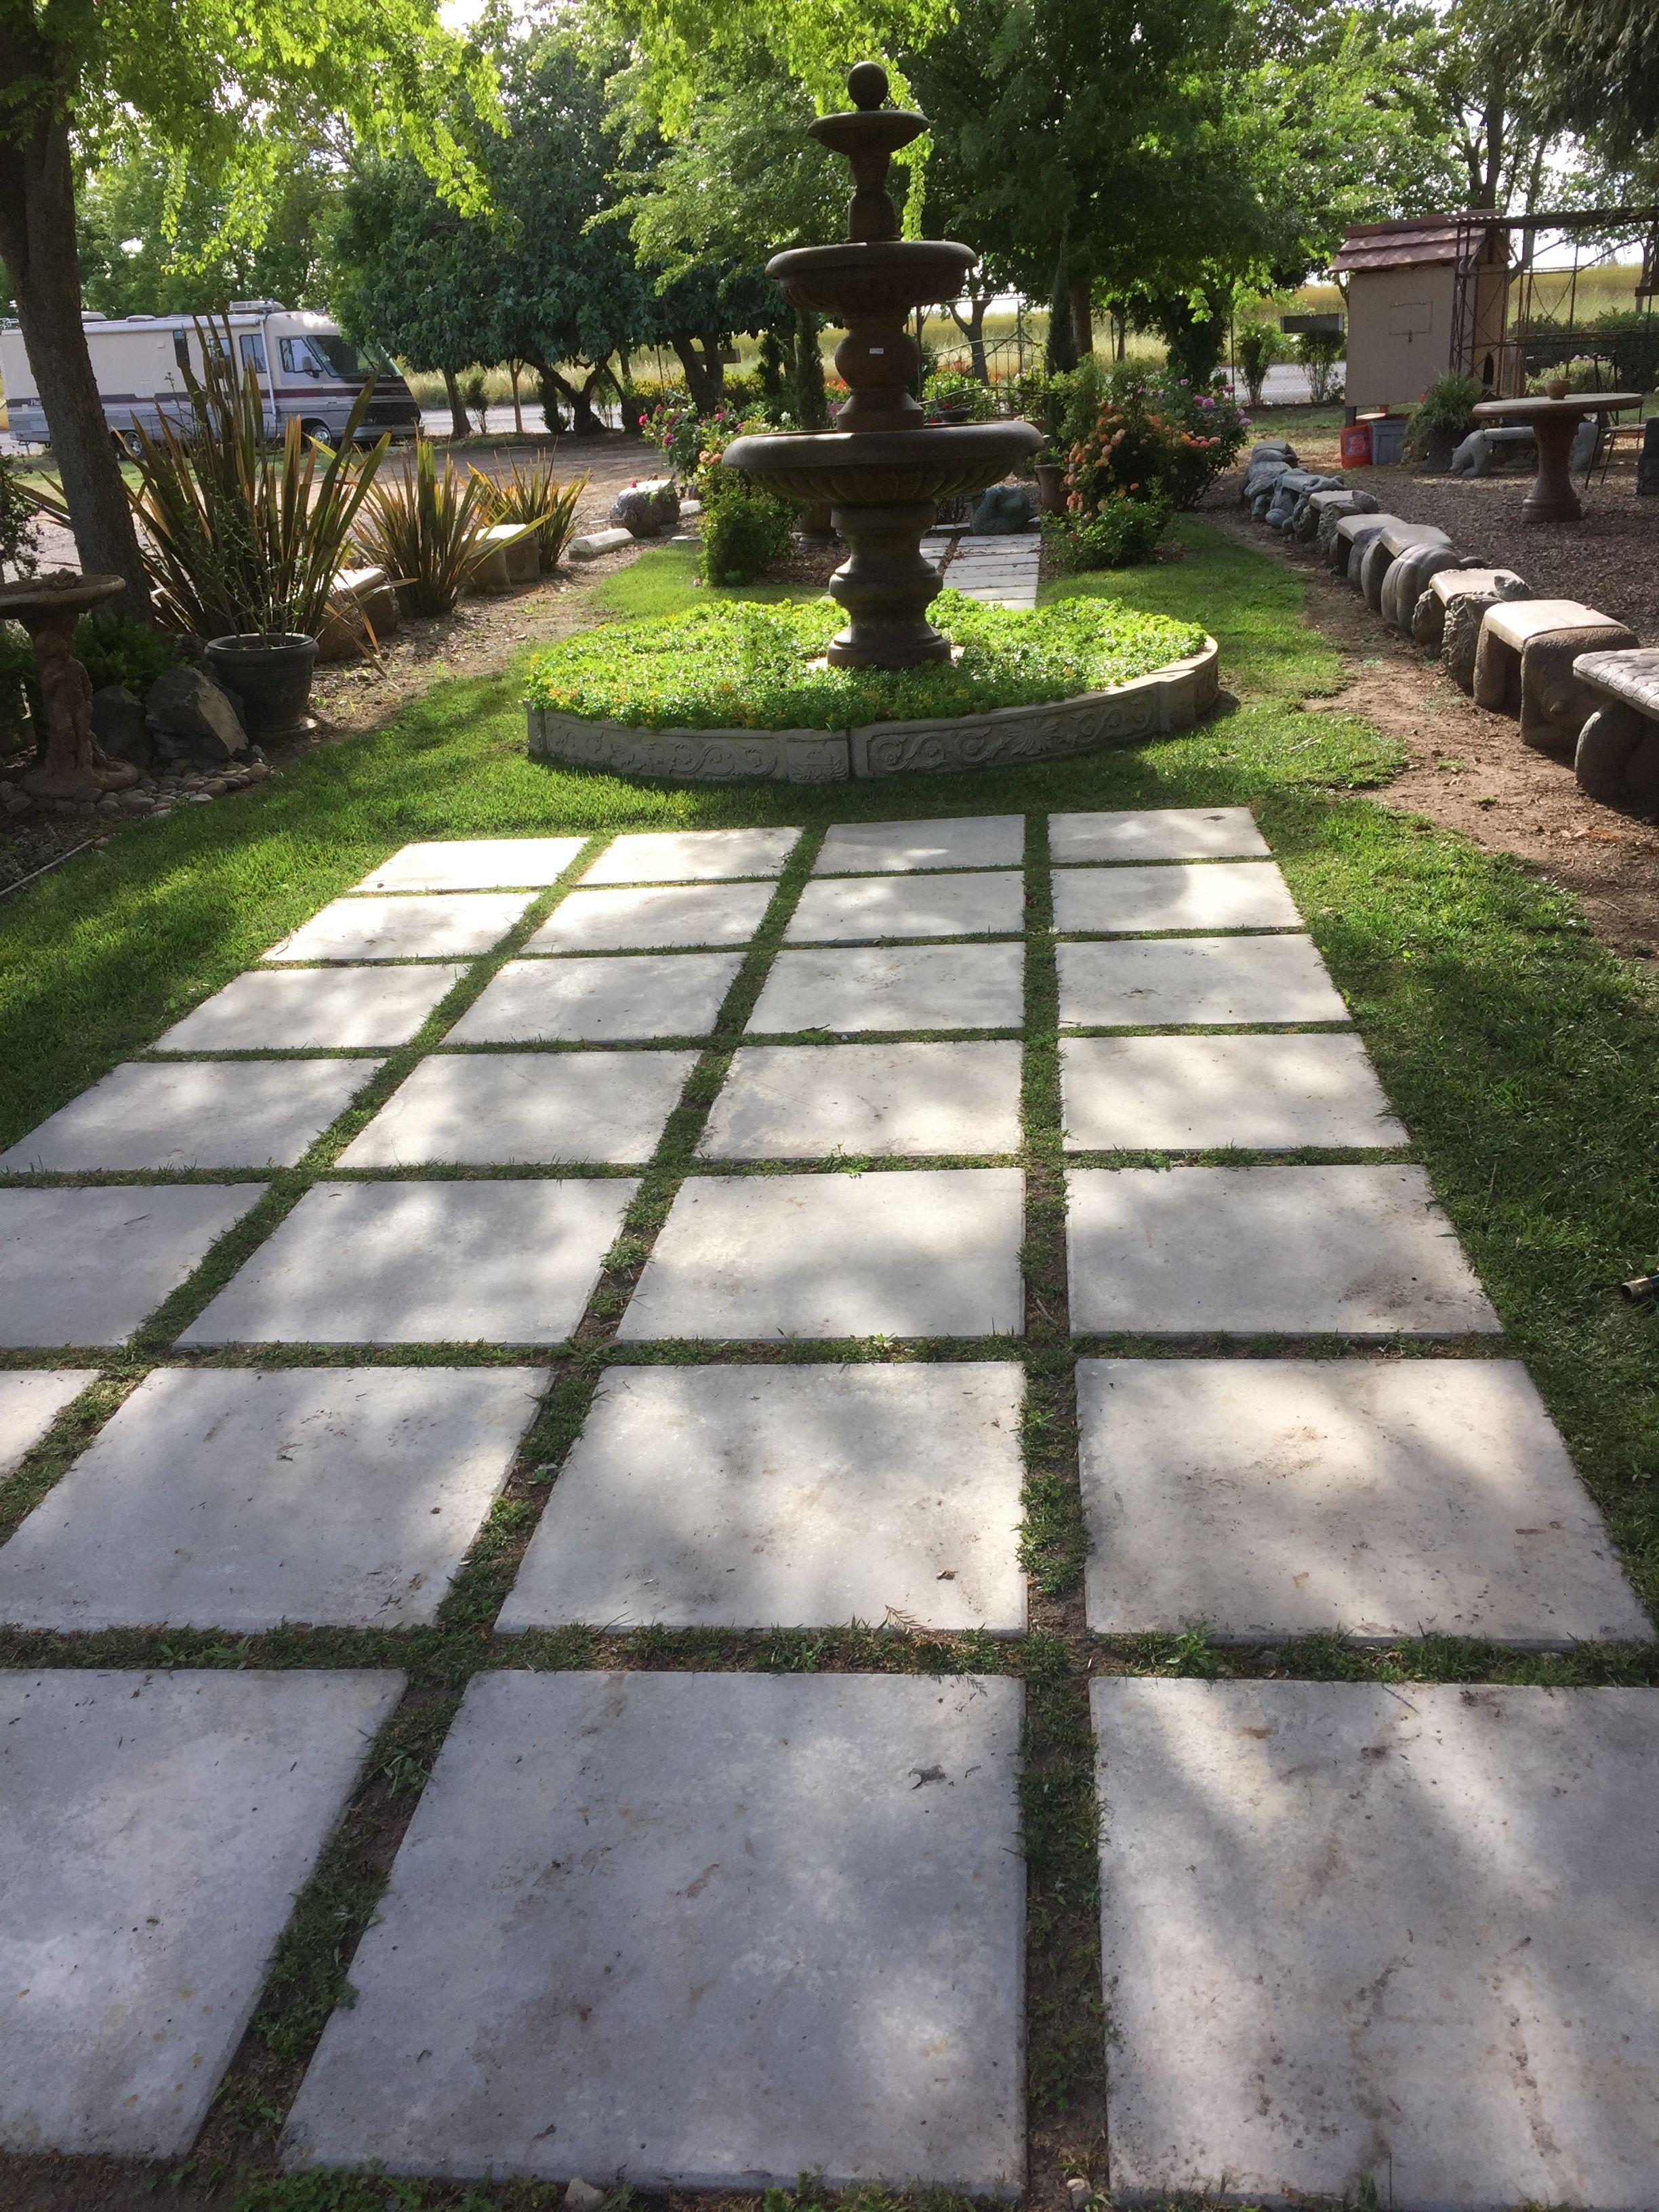 Stepping Stones Lomeli Gardens 10950 N Highway 99 Lodi Ca 95240 209 369 6461 Sidewalk Structures